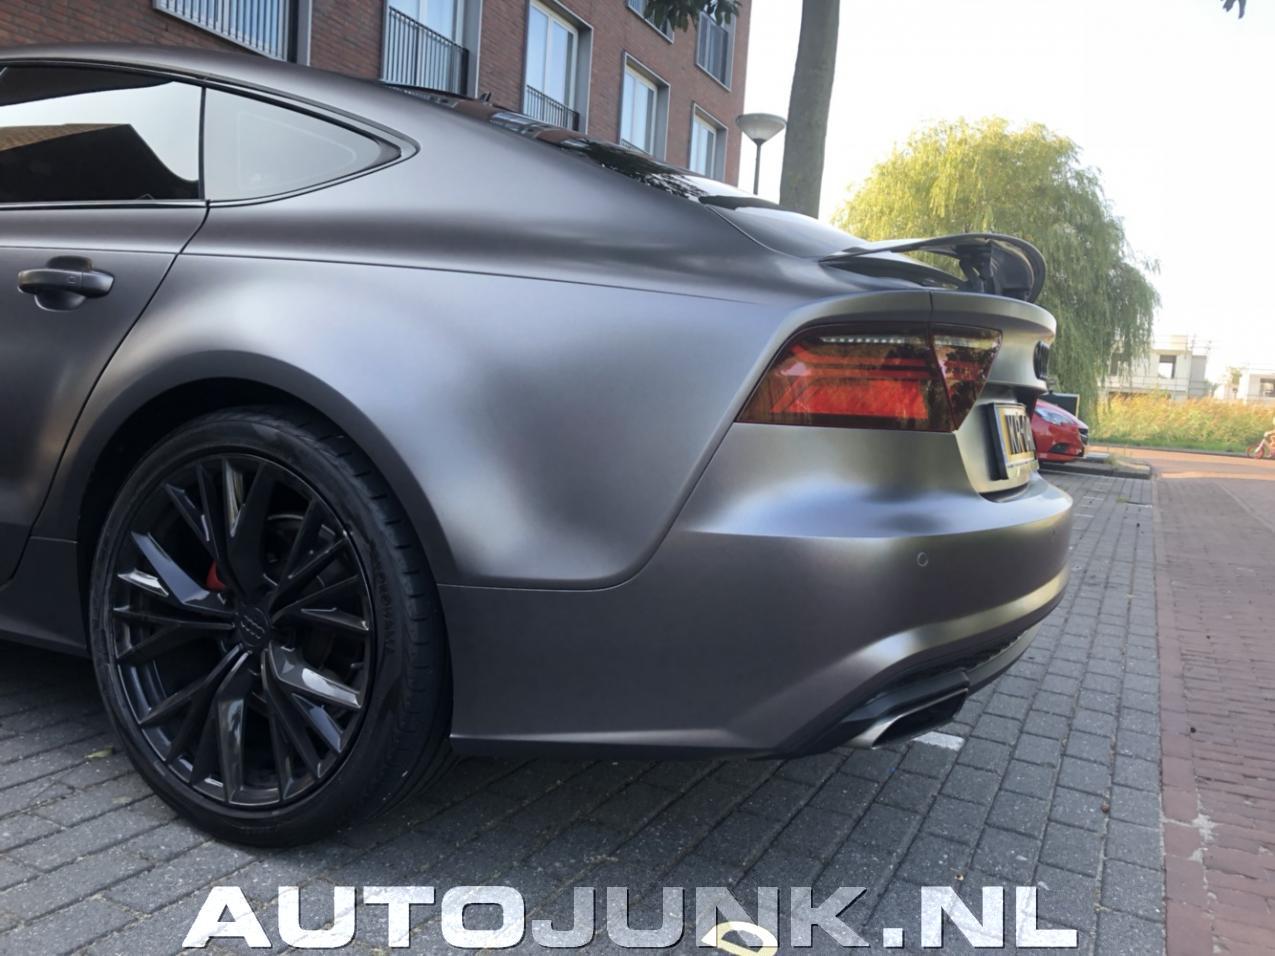 Mat Grijze A7 S Line Op Zwarte Velgen Mag Dit Fotos